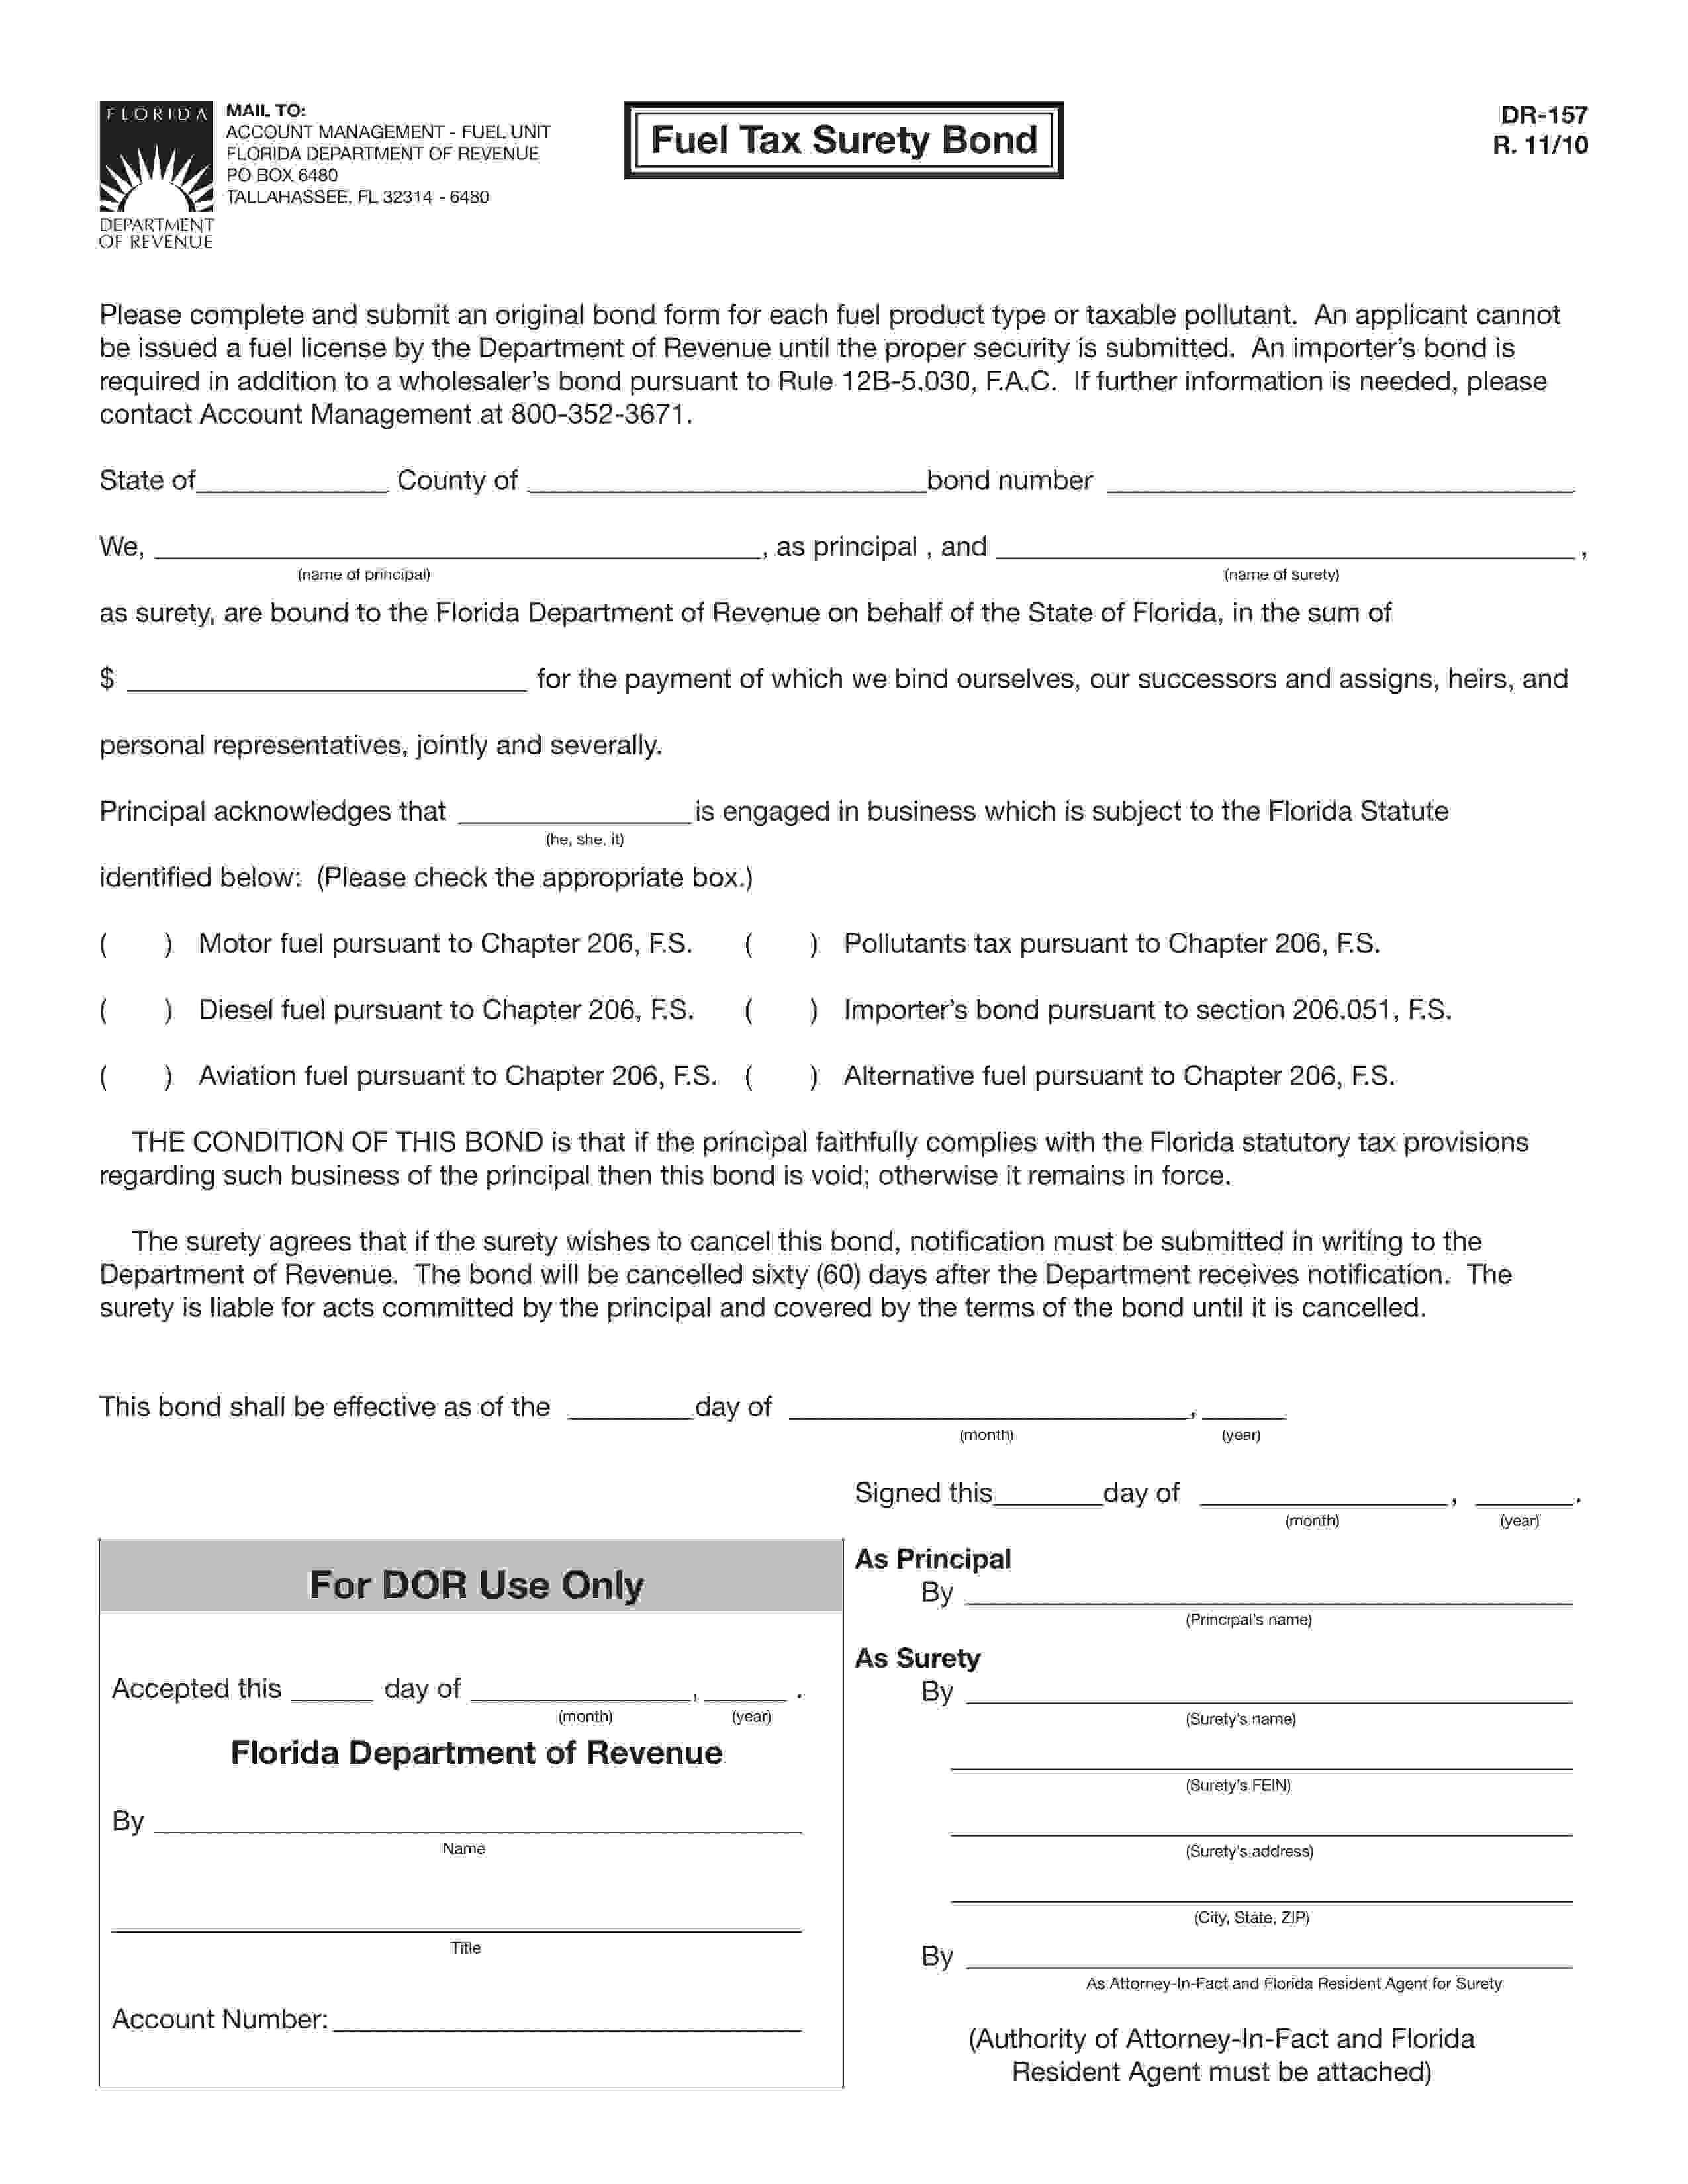 Florida Department Of Revenue, Fuel Unit Fuel Tax: Diesel Fuel Bond sample image